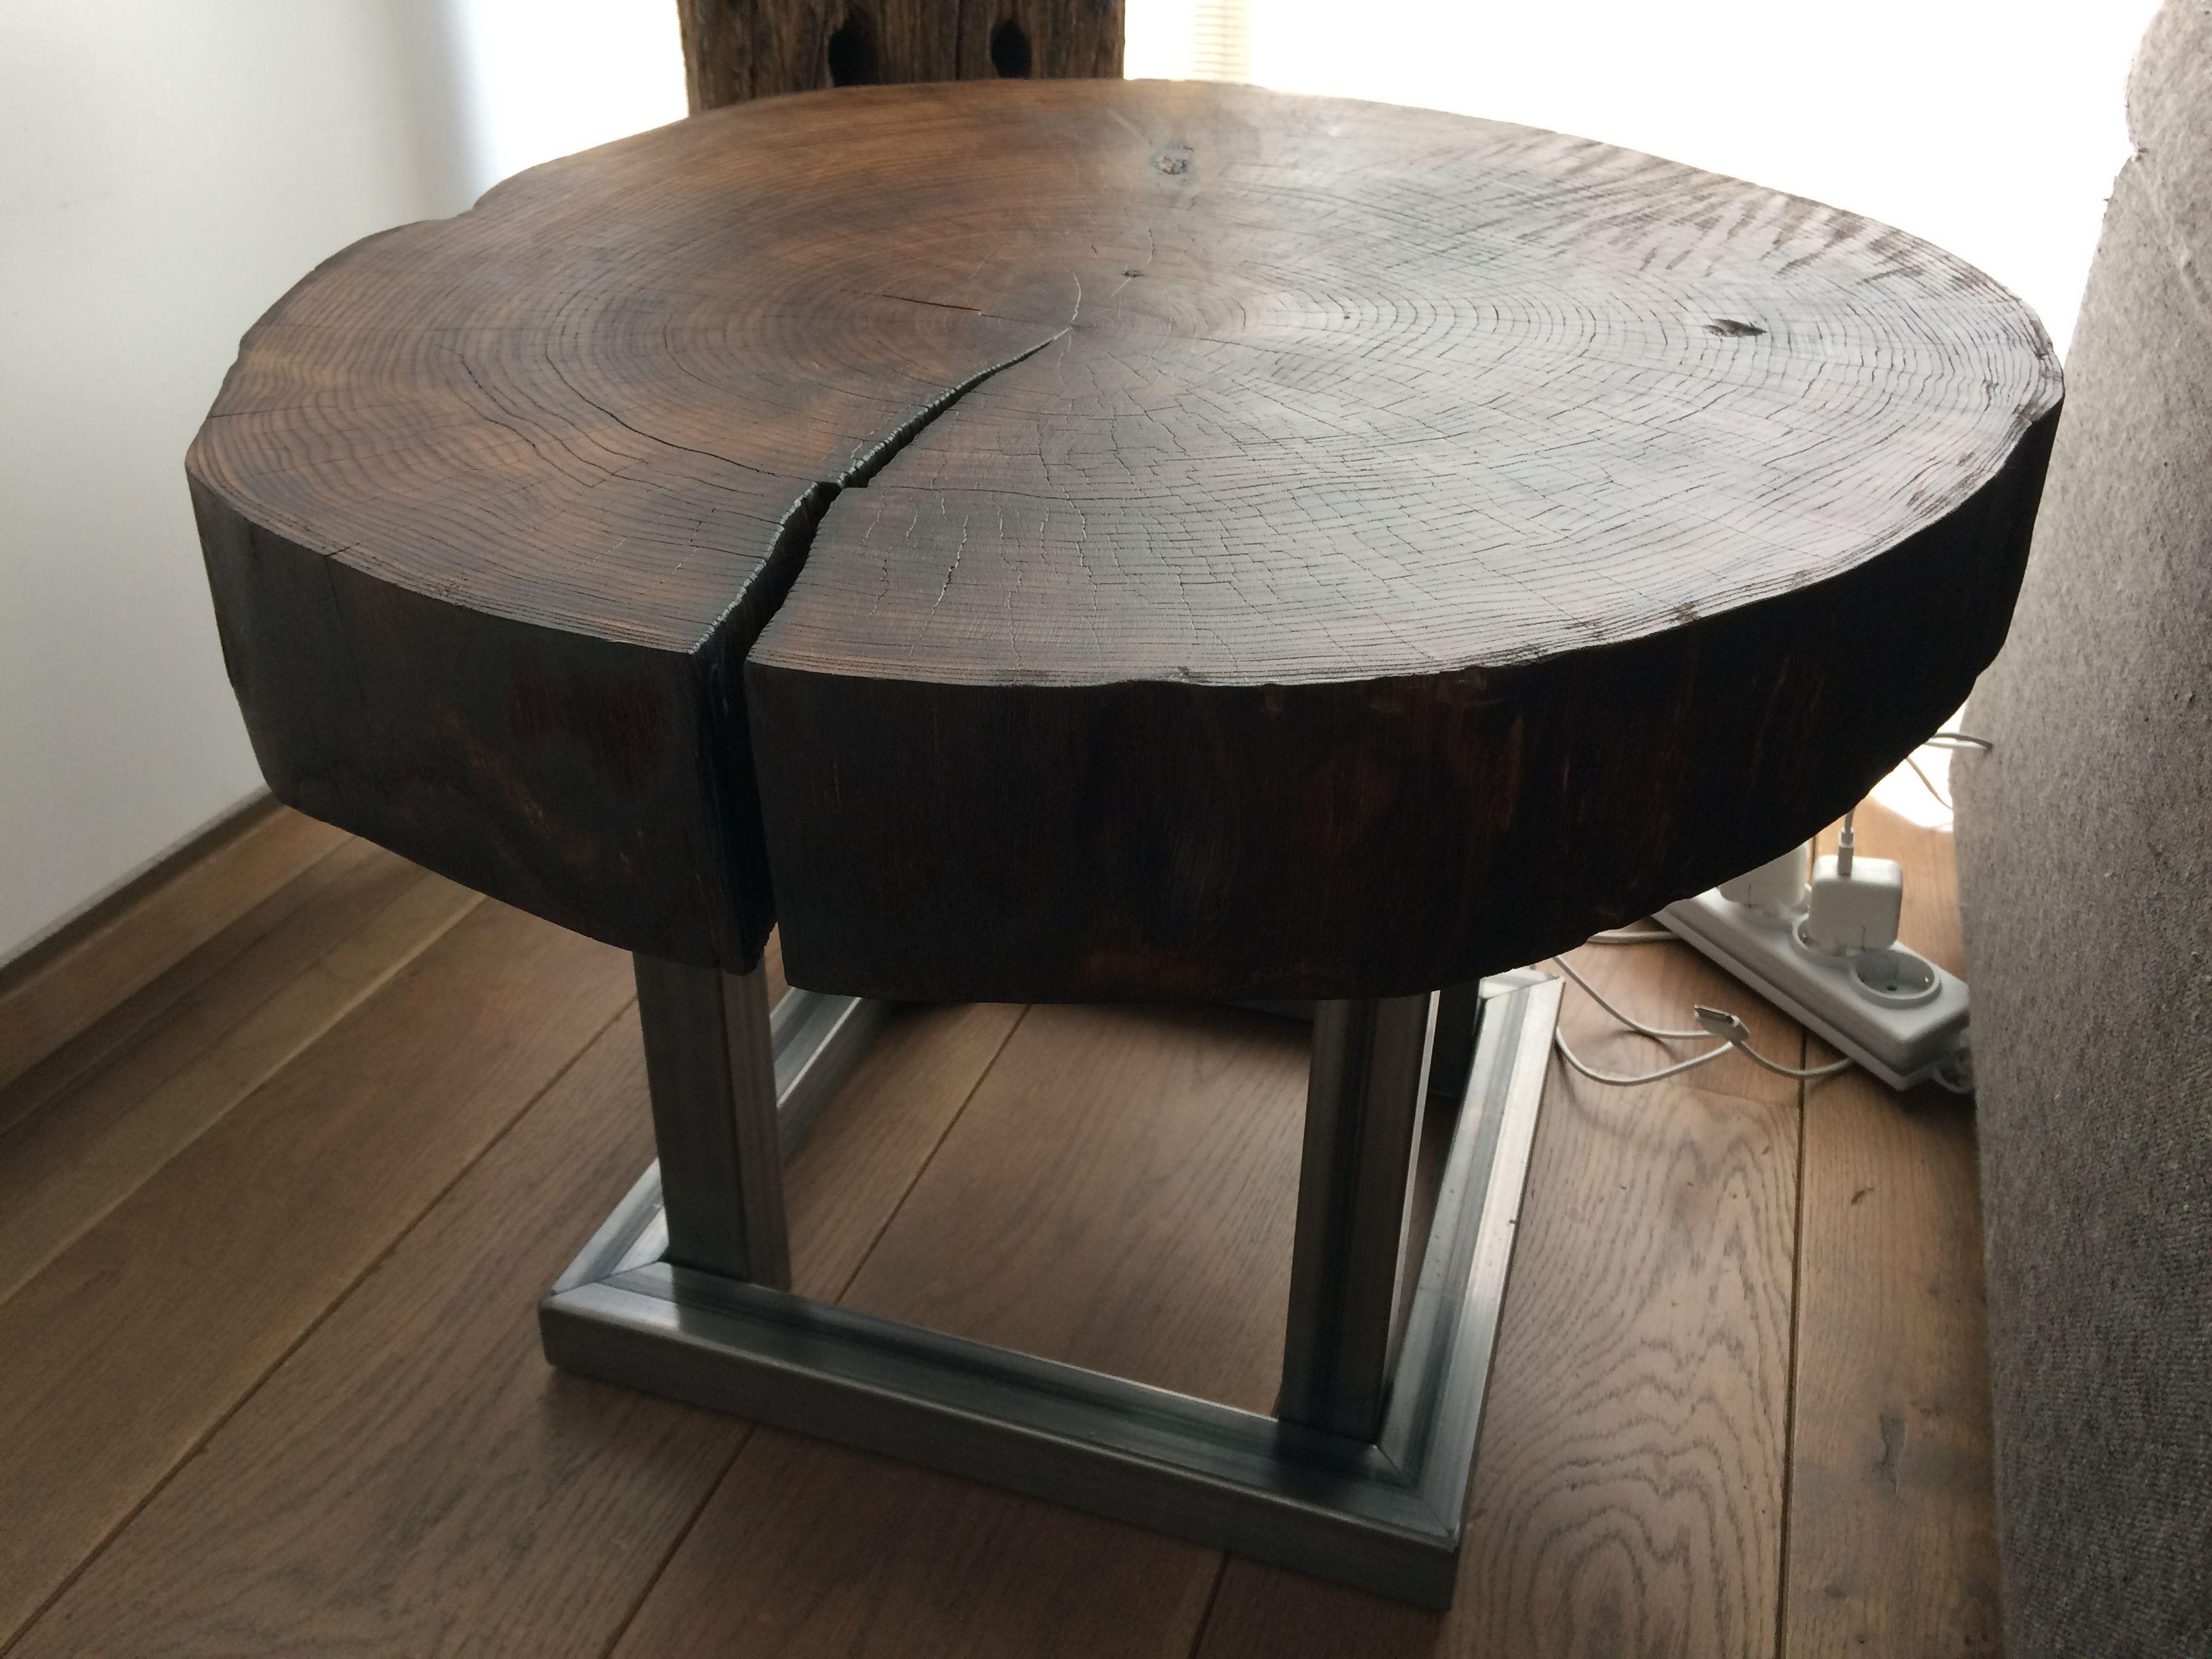 Pin by EffectiveHouse on Мебель и свет в стиле лофт